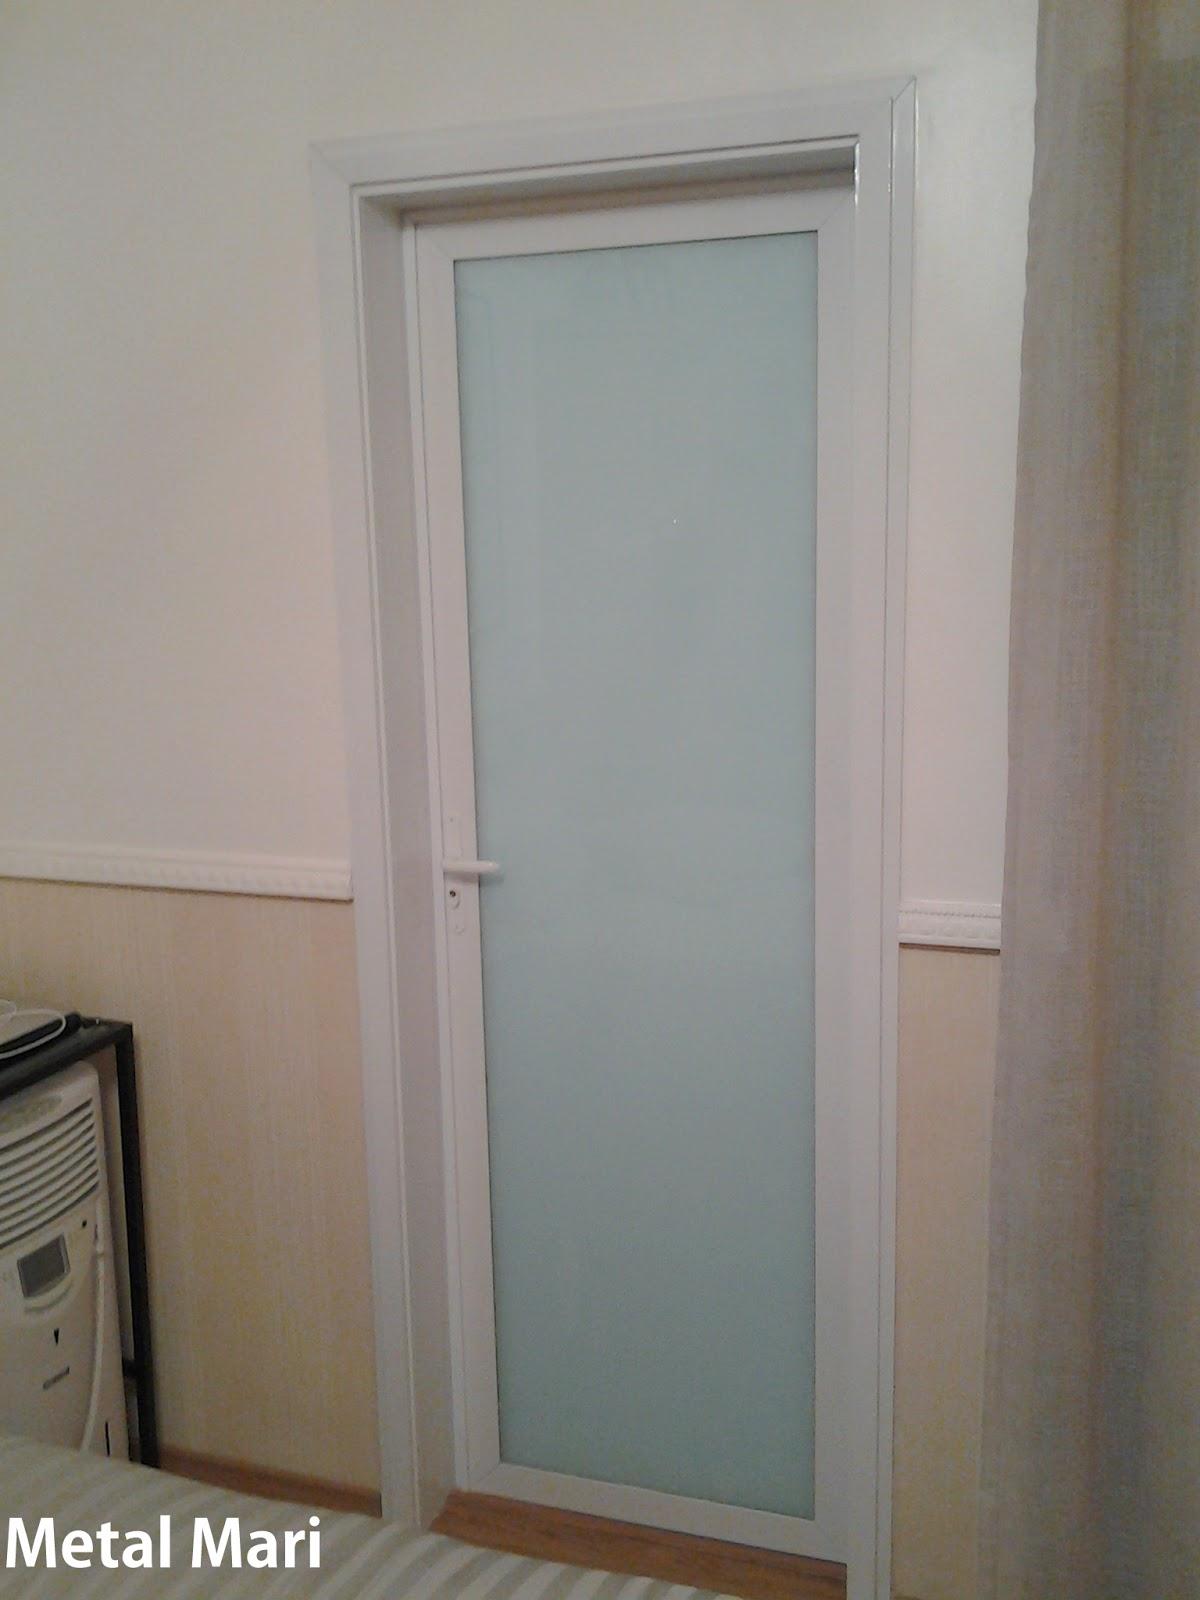 #5B493A Porta de alumínio branco com vidro de 8 mm temperado incolor 1054 Portas E Janelas De Aluminio E Vidro